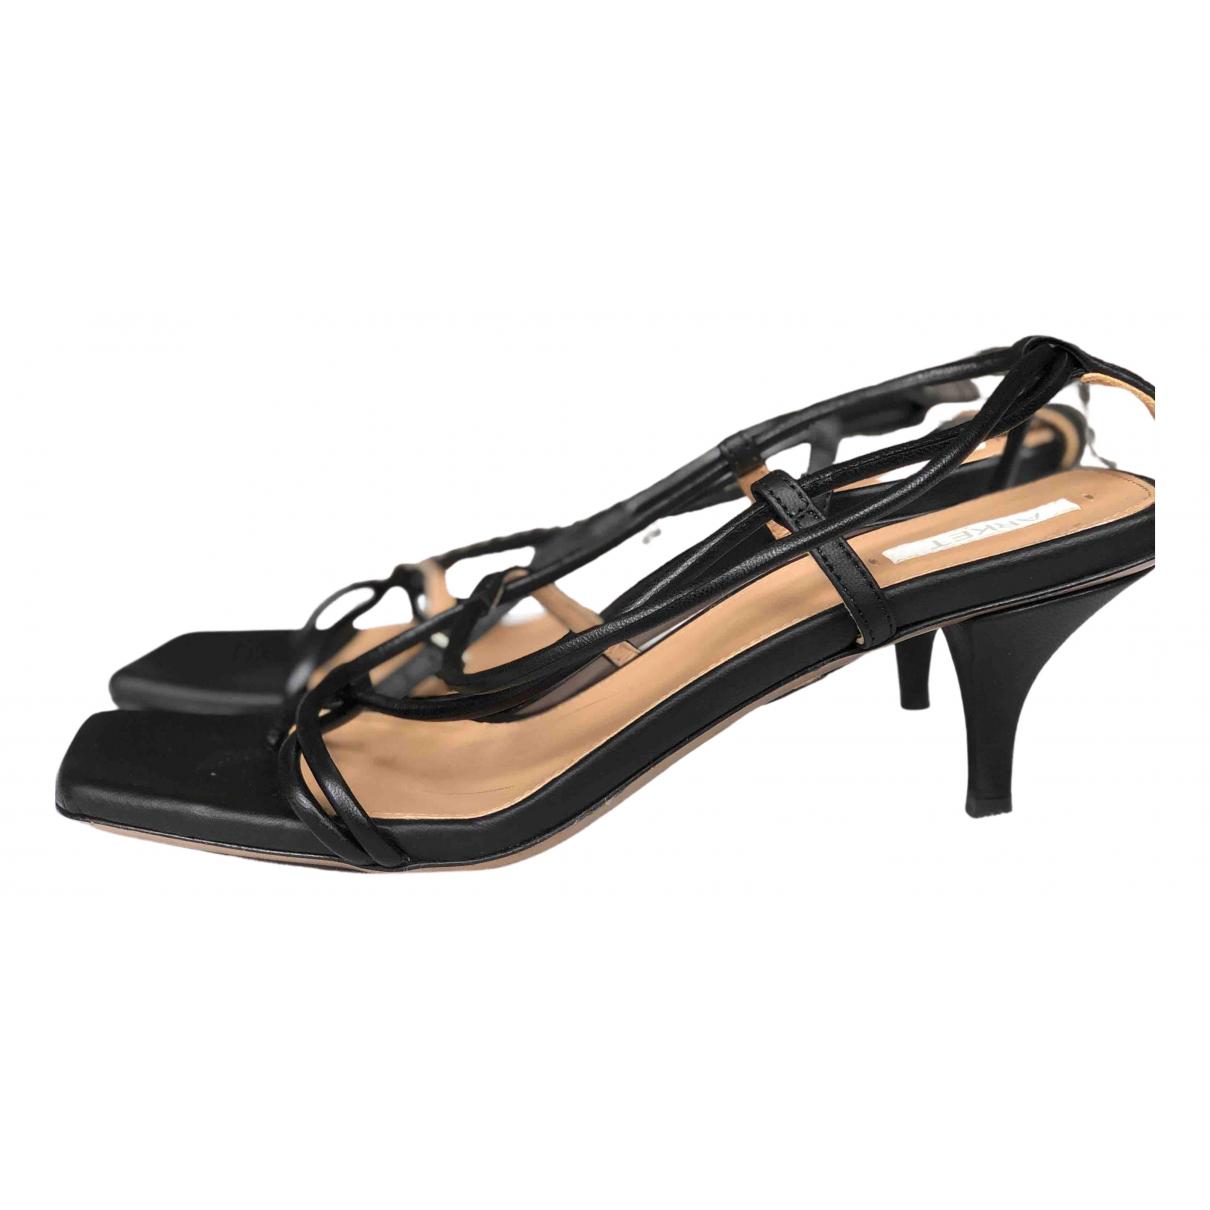 Arket N Black Leather Sandals for Women 38 EU